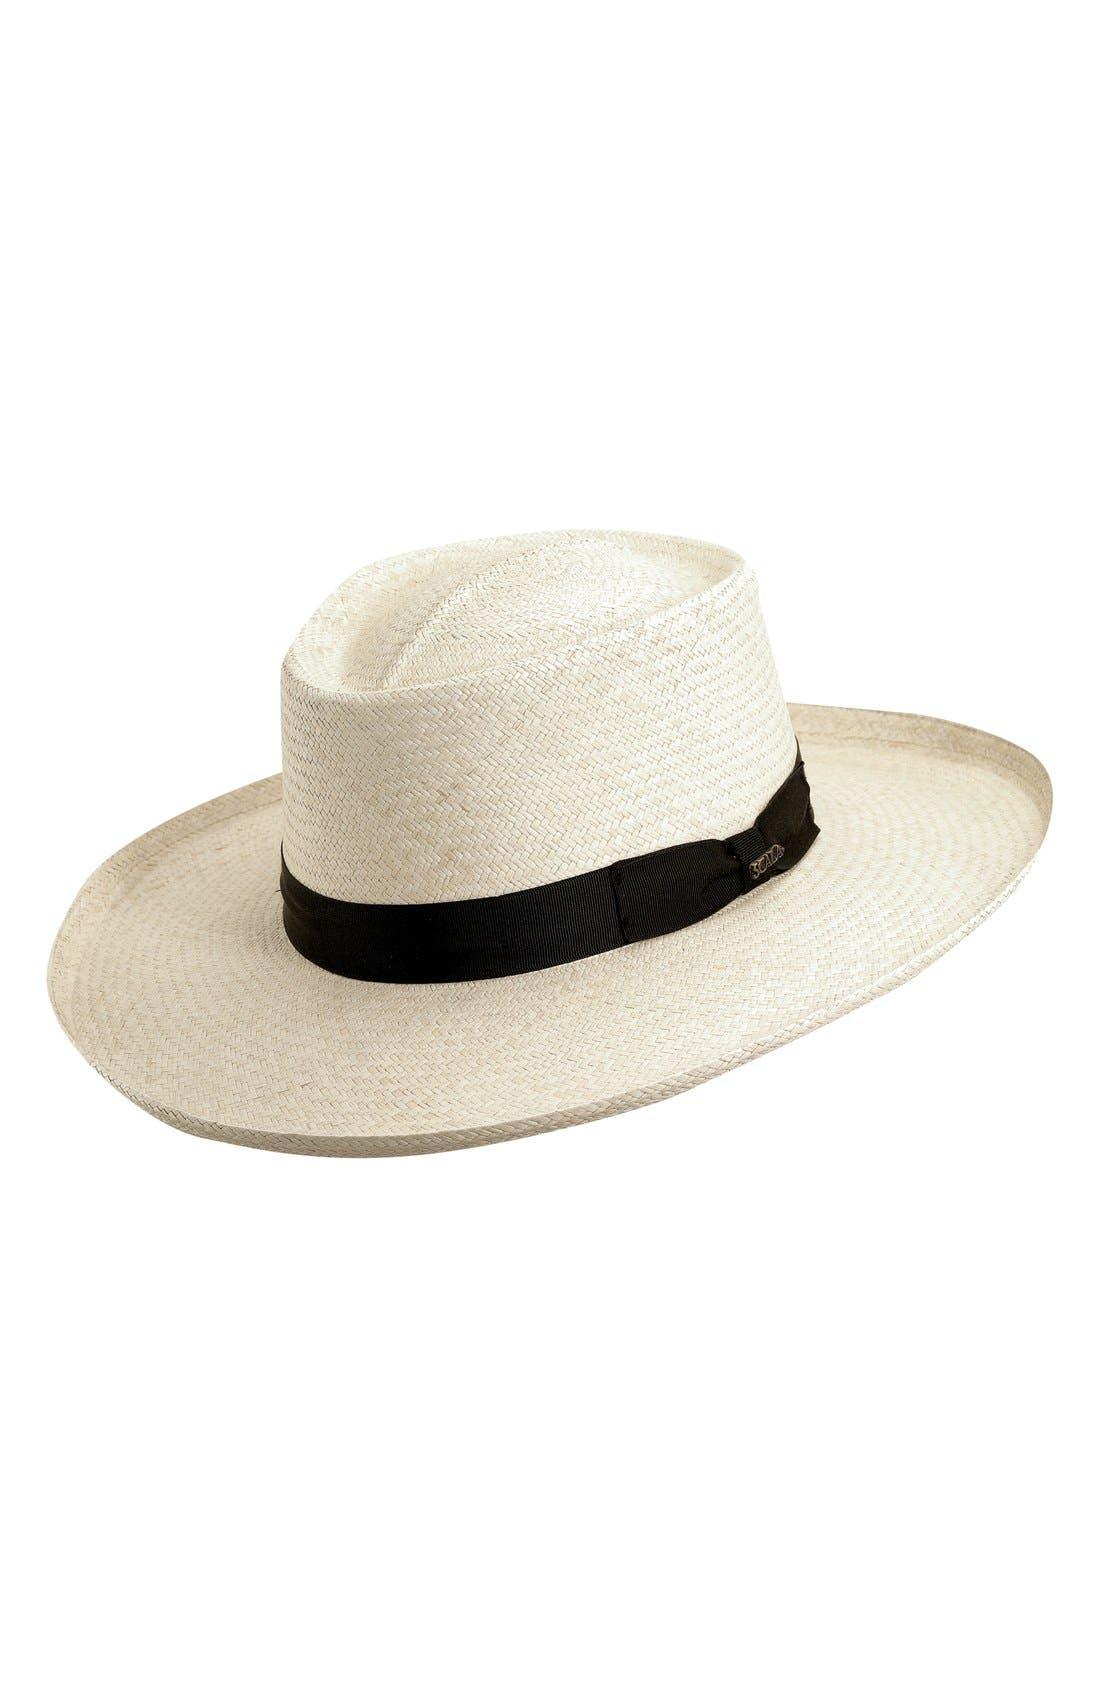 Men's Steampunk Clothing, Costumes, Fashion Mens Scala Straw Gambler Hat - White $130.00 AT vintagedancer.com